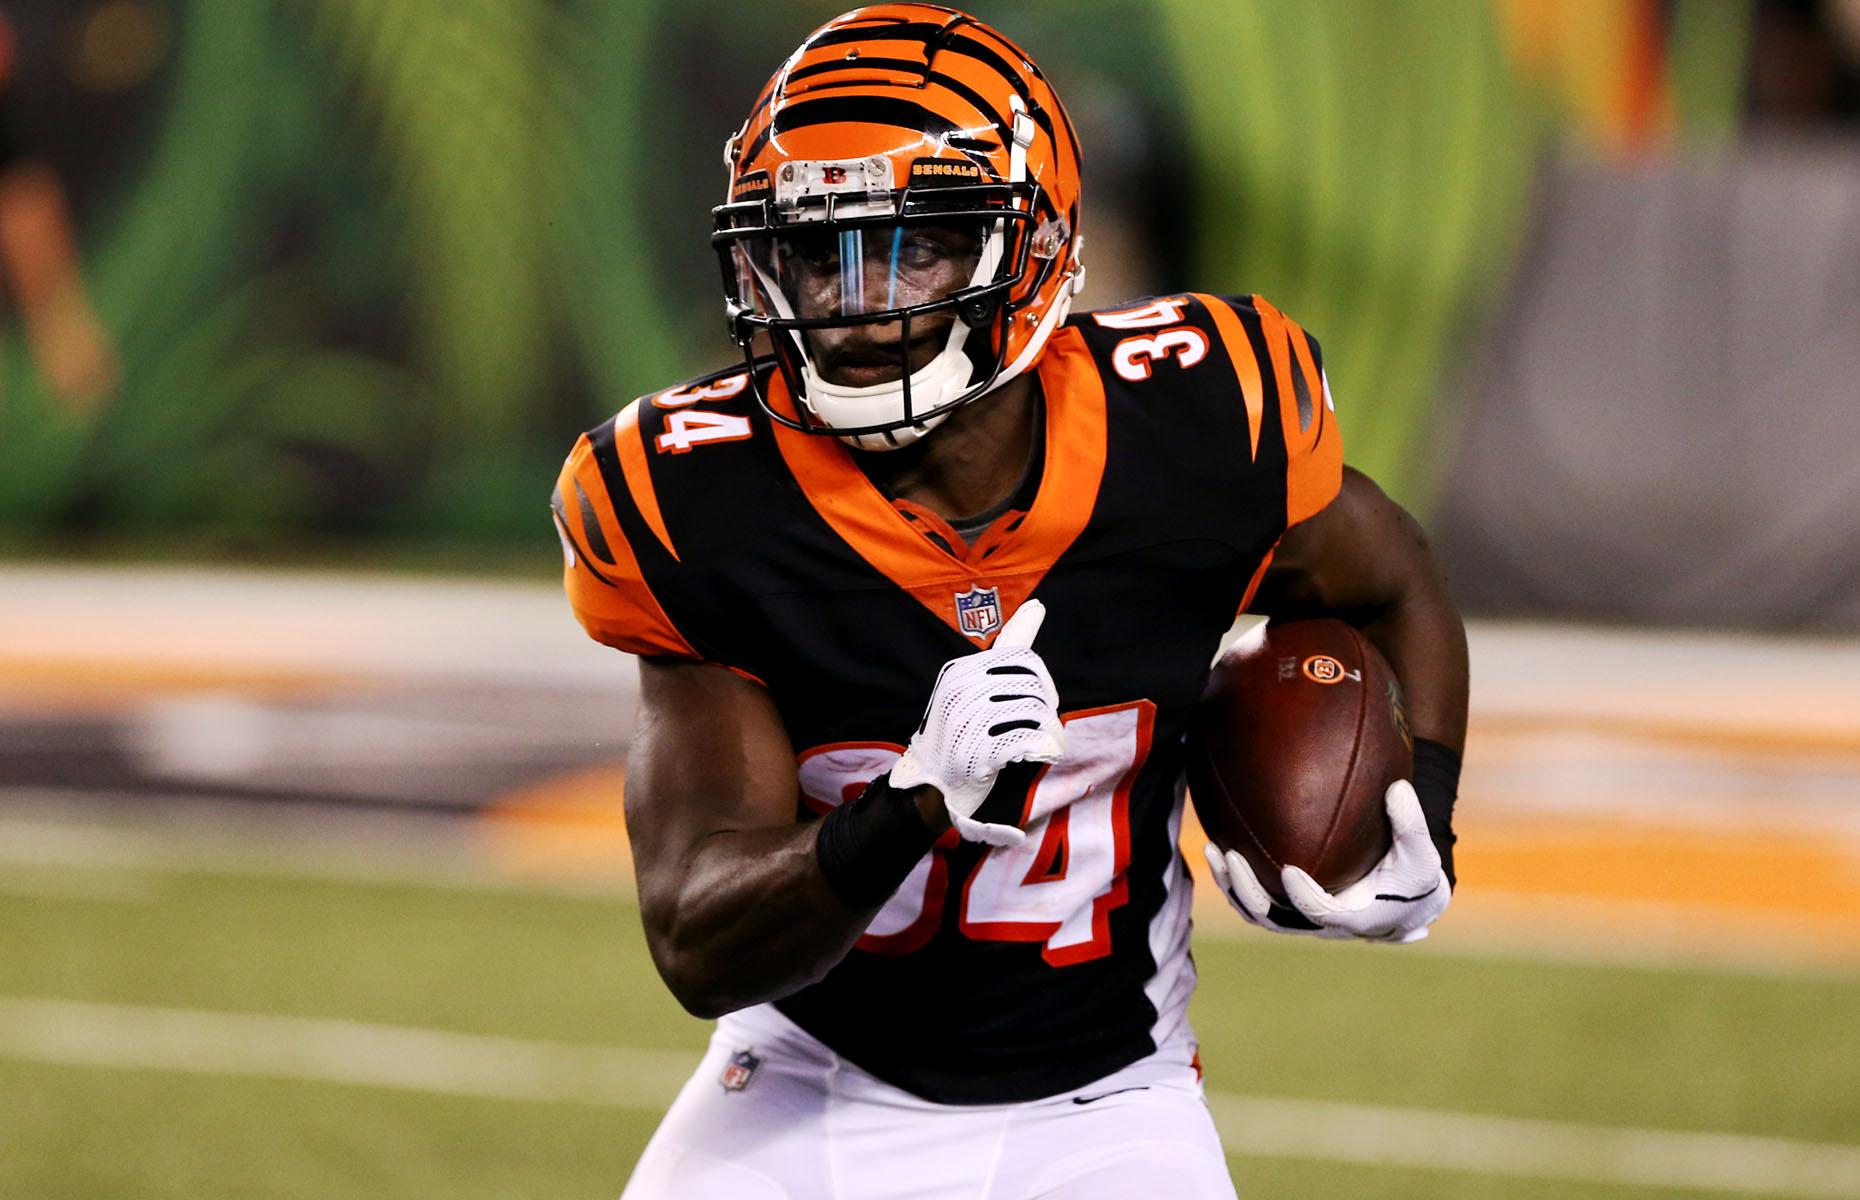 Quinton Flowers 36 News, Stats, Photos , Indianapolis Colts